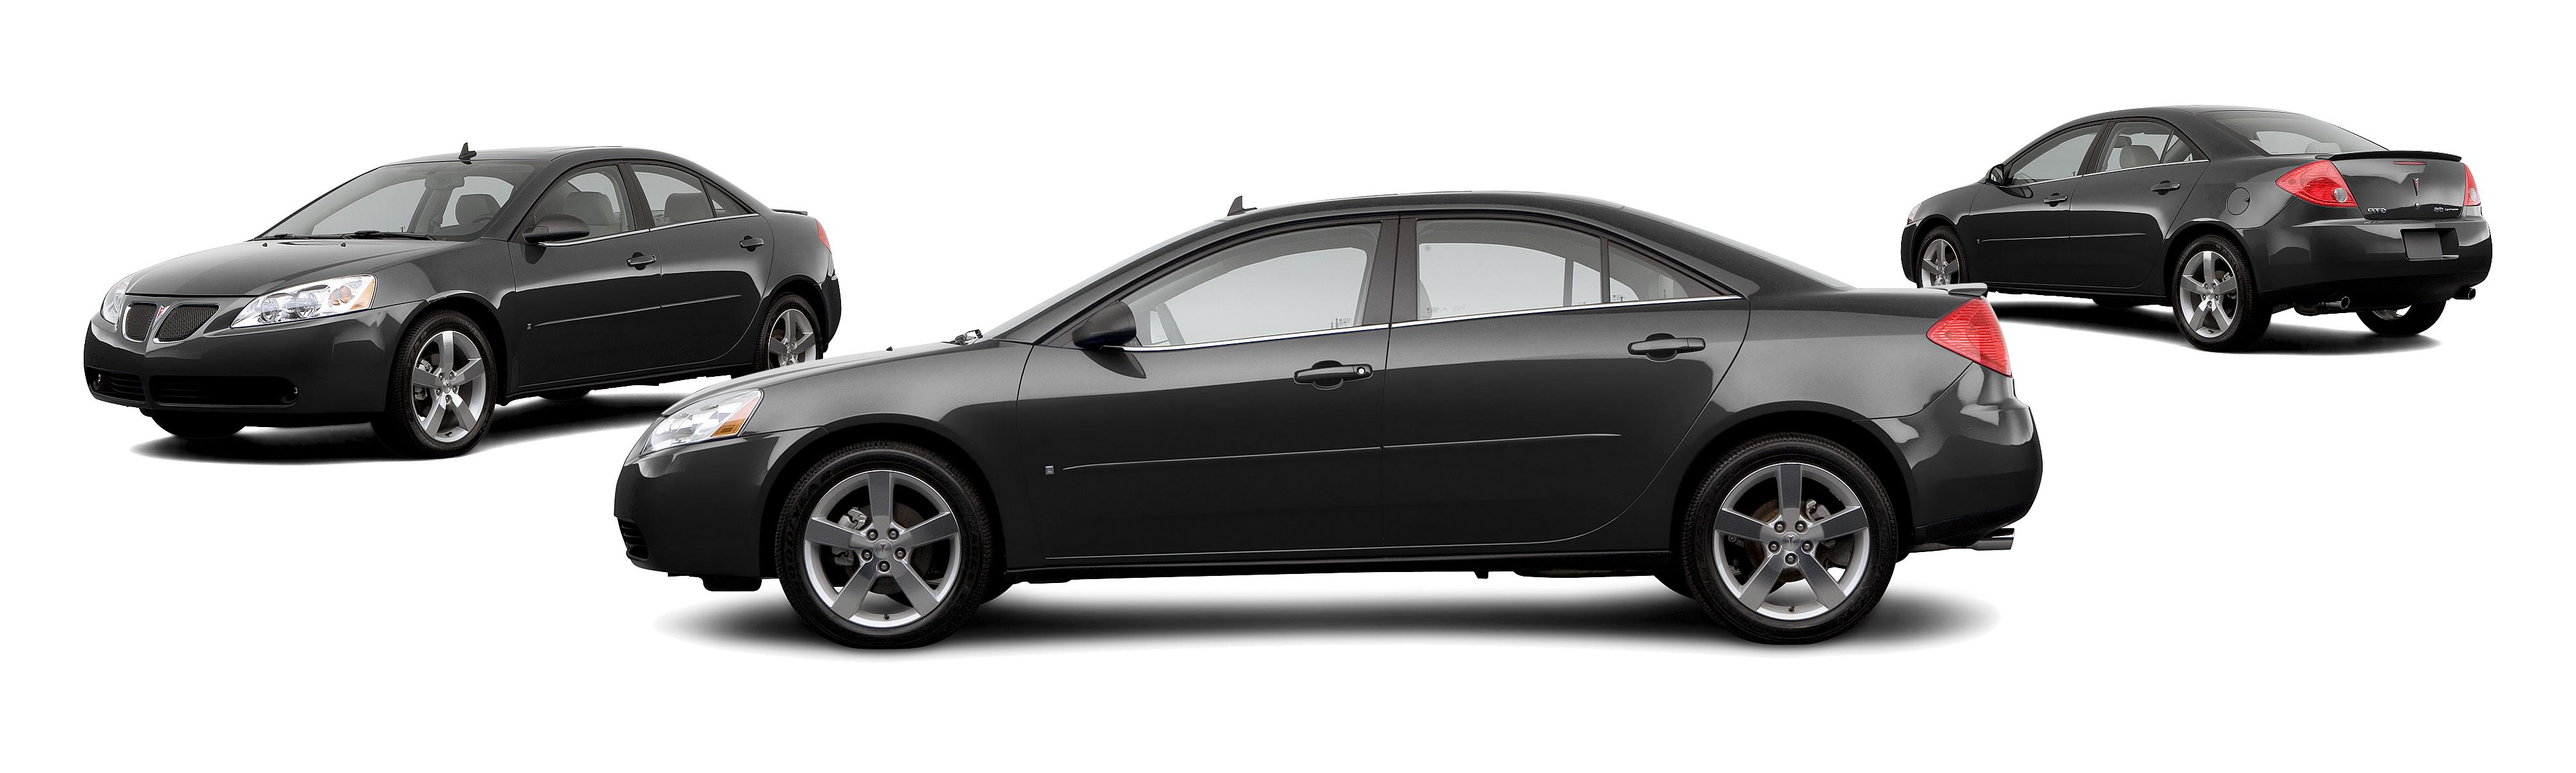 2007 Pontiac G6 Gt 4dr Sedan Research Groovecar 2010 Wiring Schematic